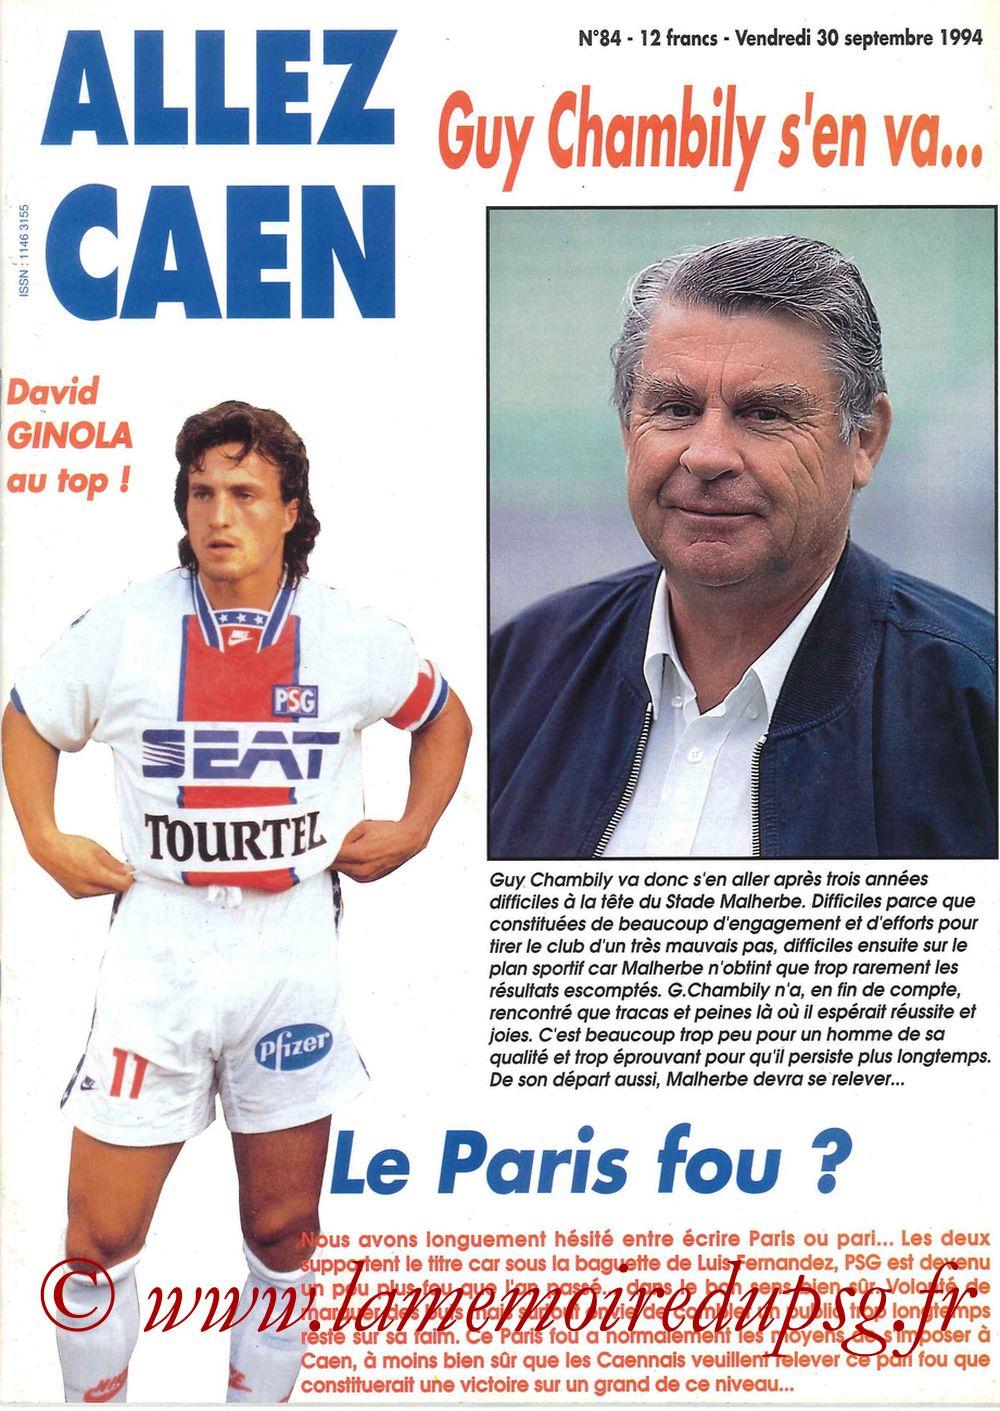 1994-09-30  Caen-PSG (11ème D1, Allez Caen N°84)